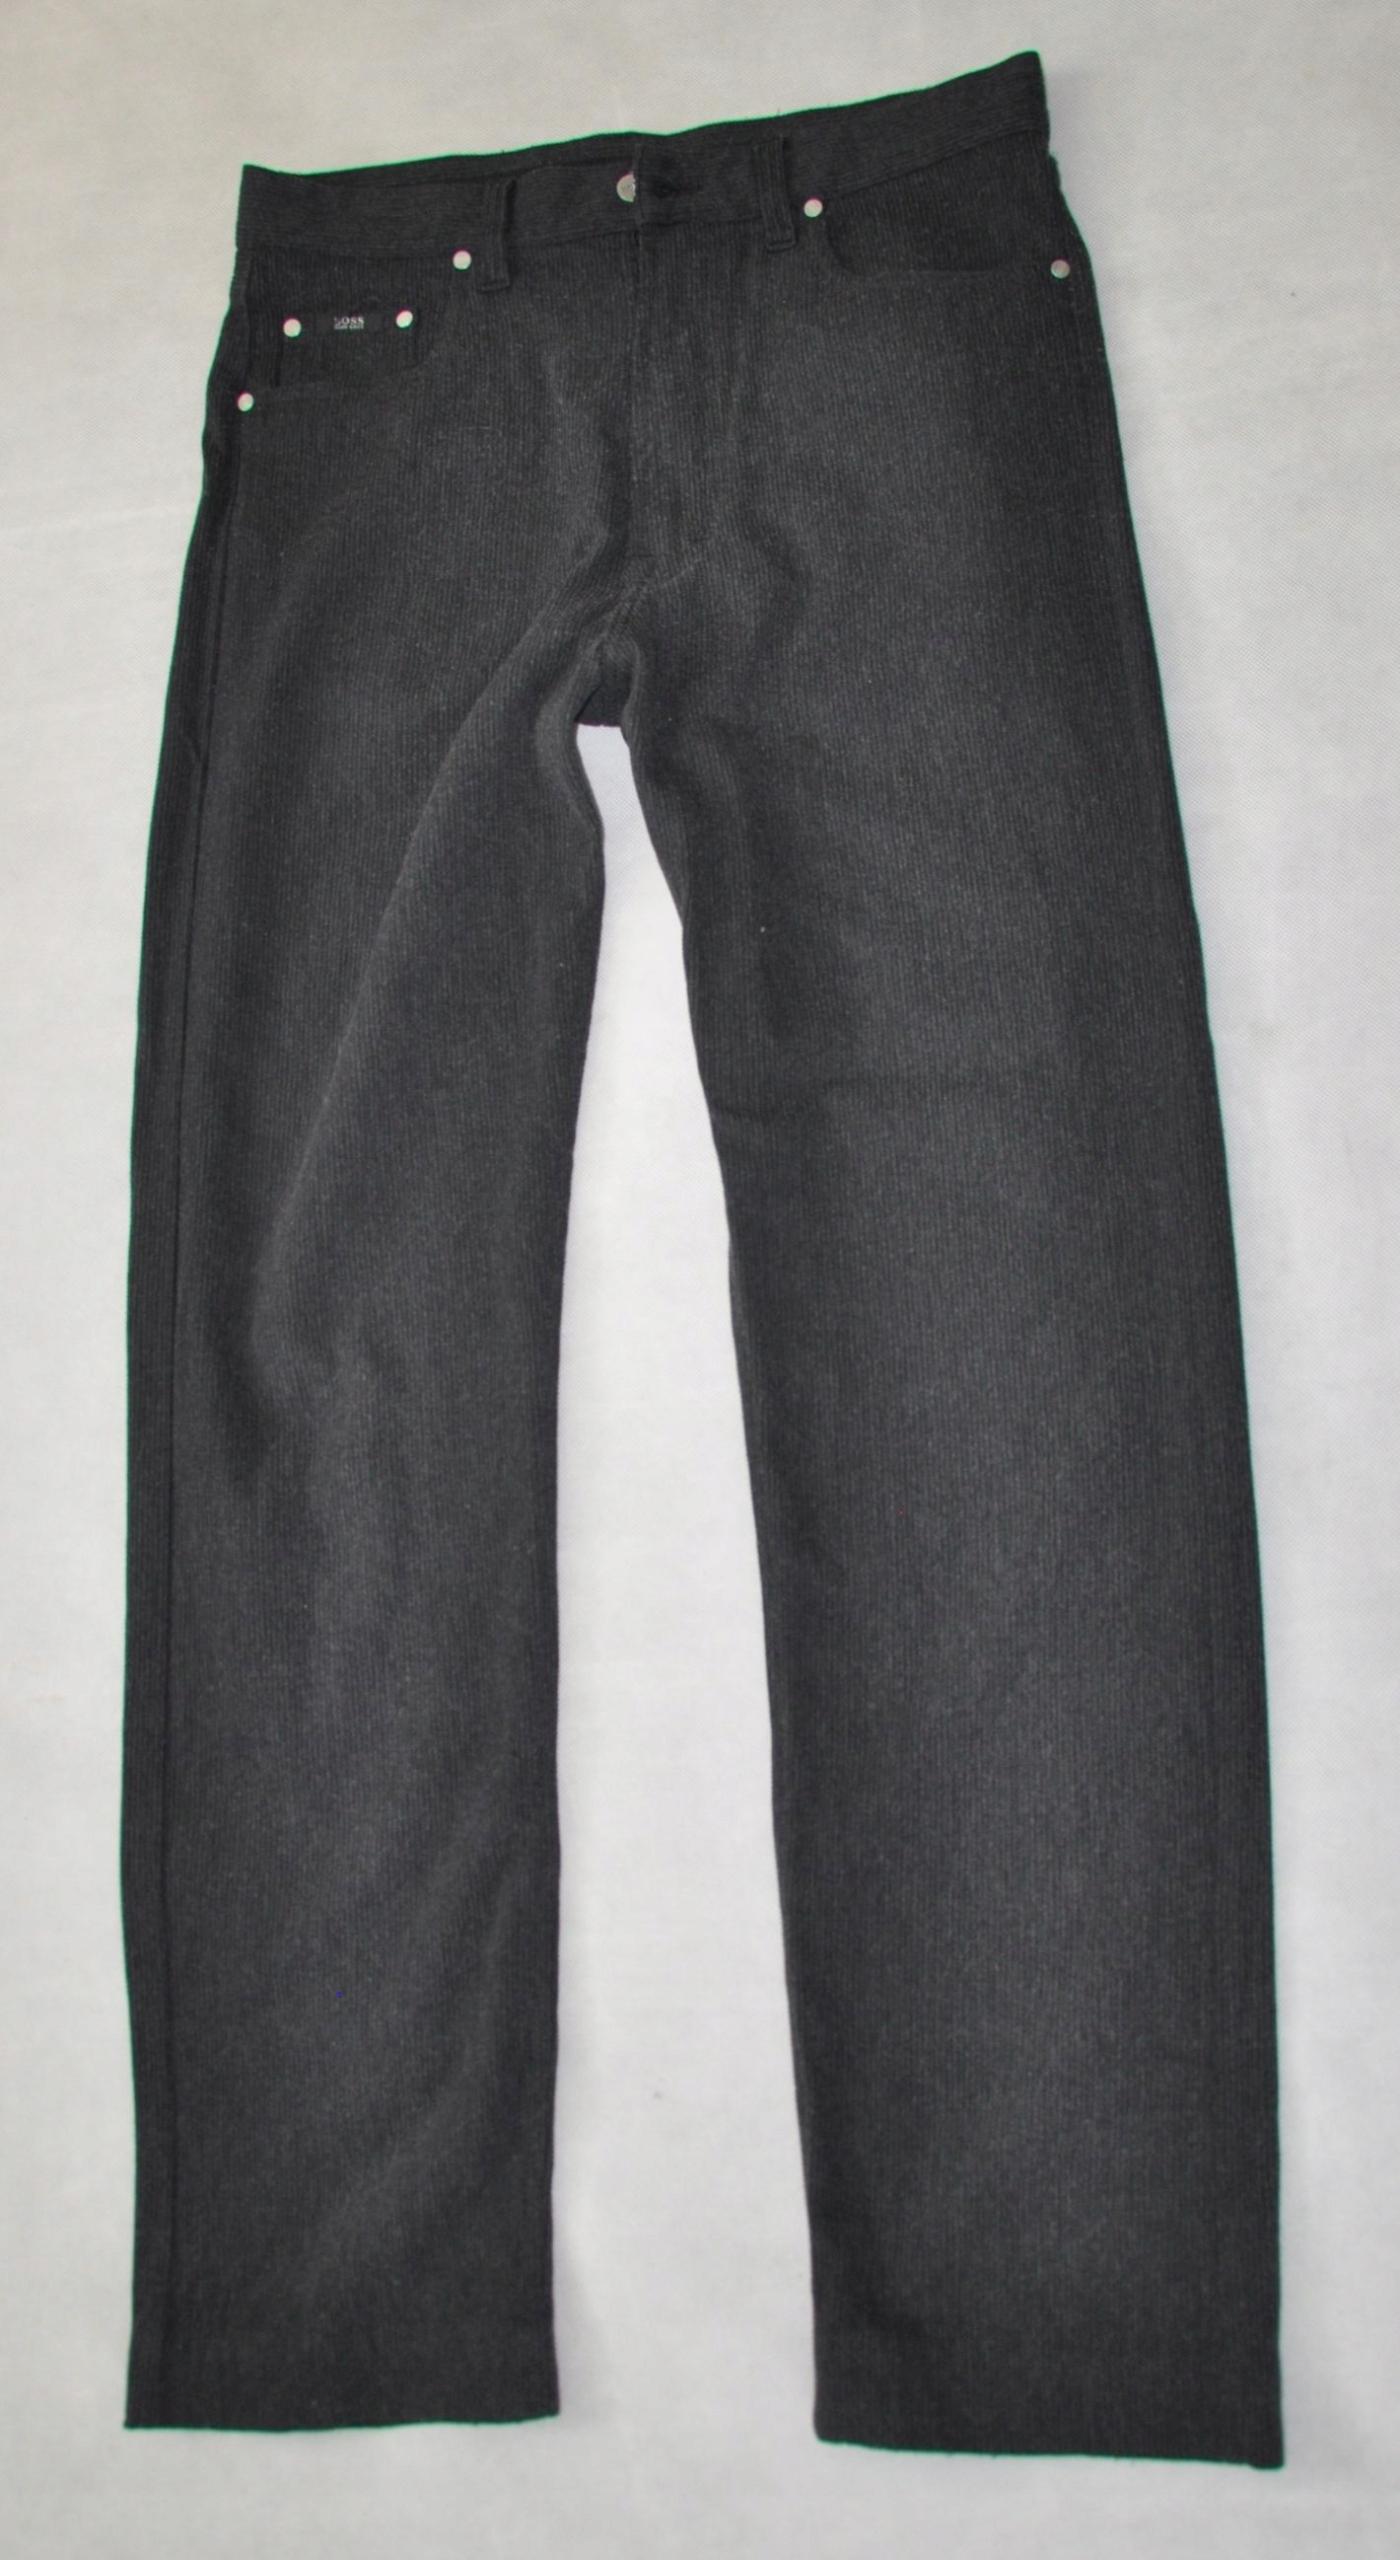 HUGO BOSS ALABAMA spodnie czarne 34/36 88pas